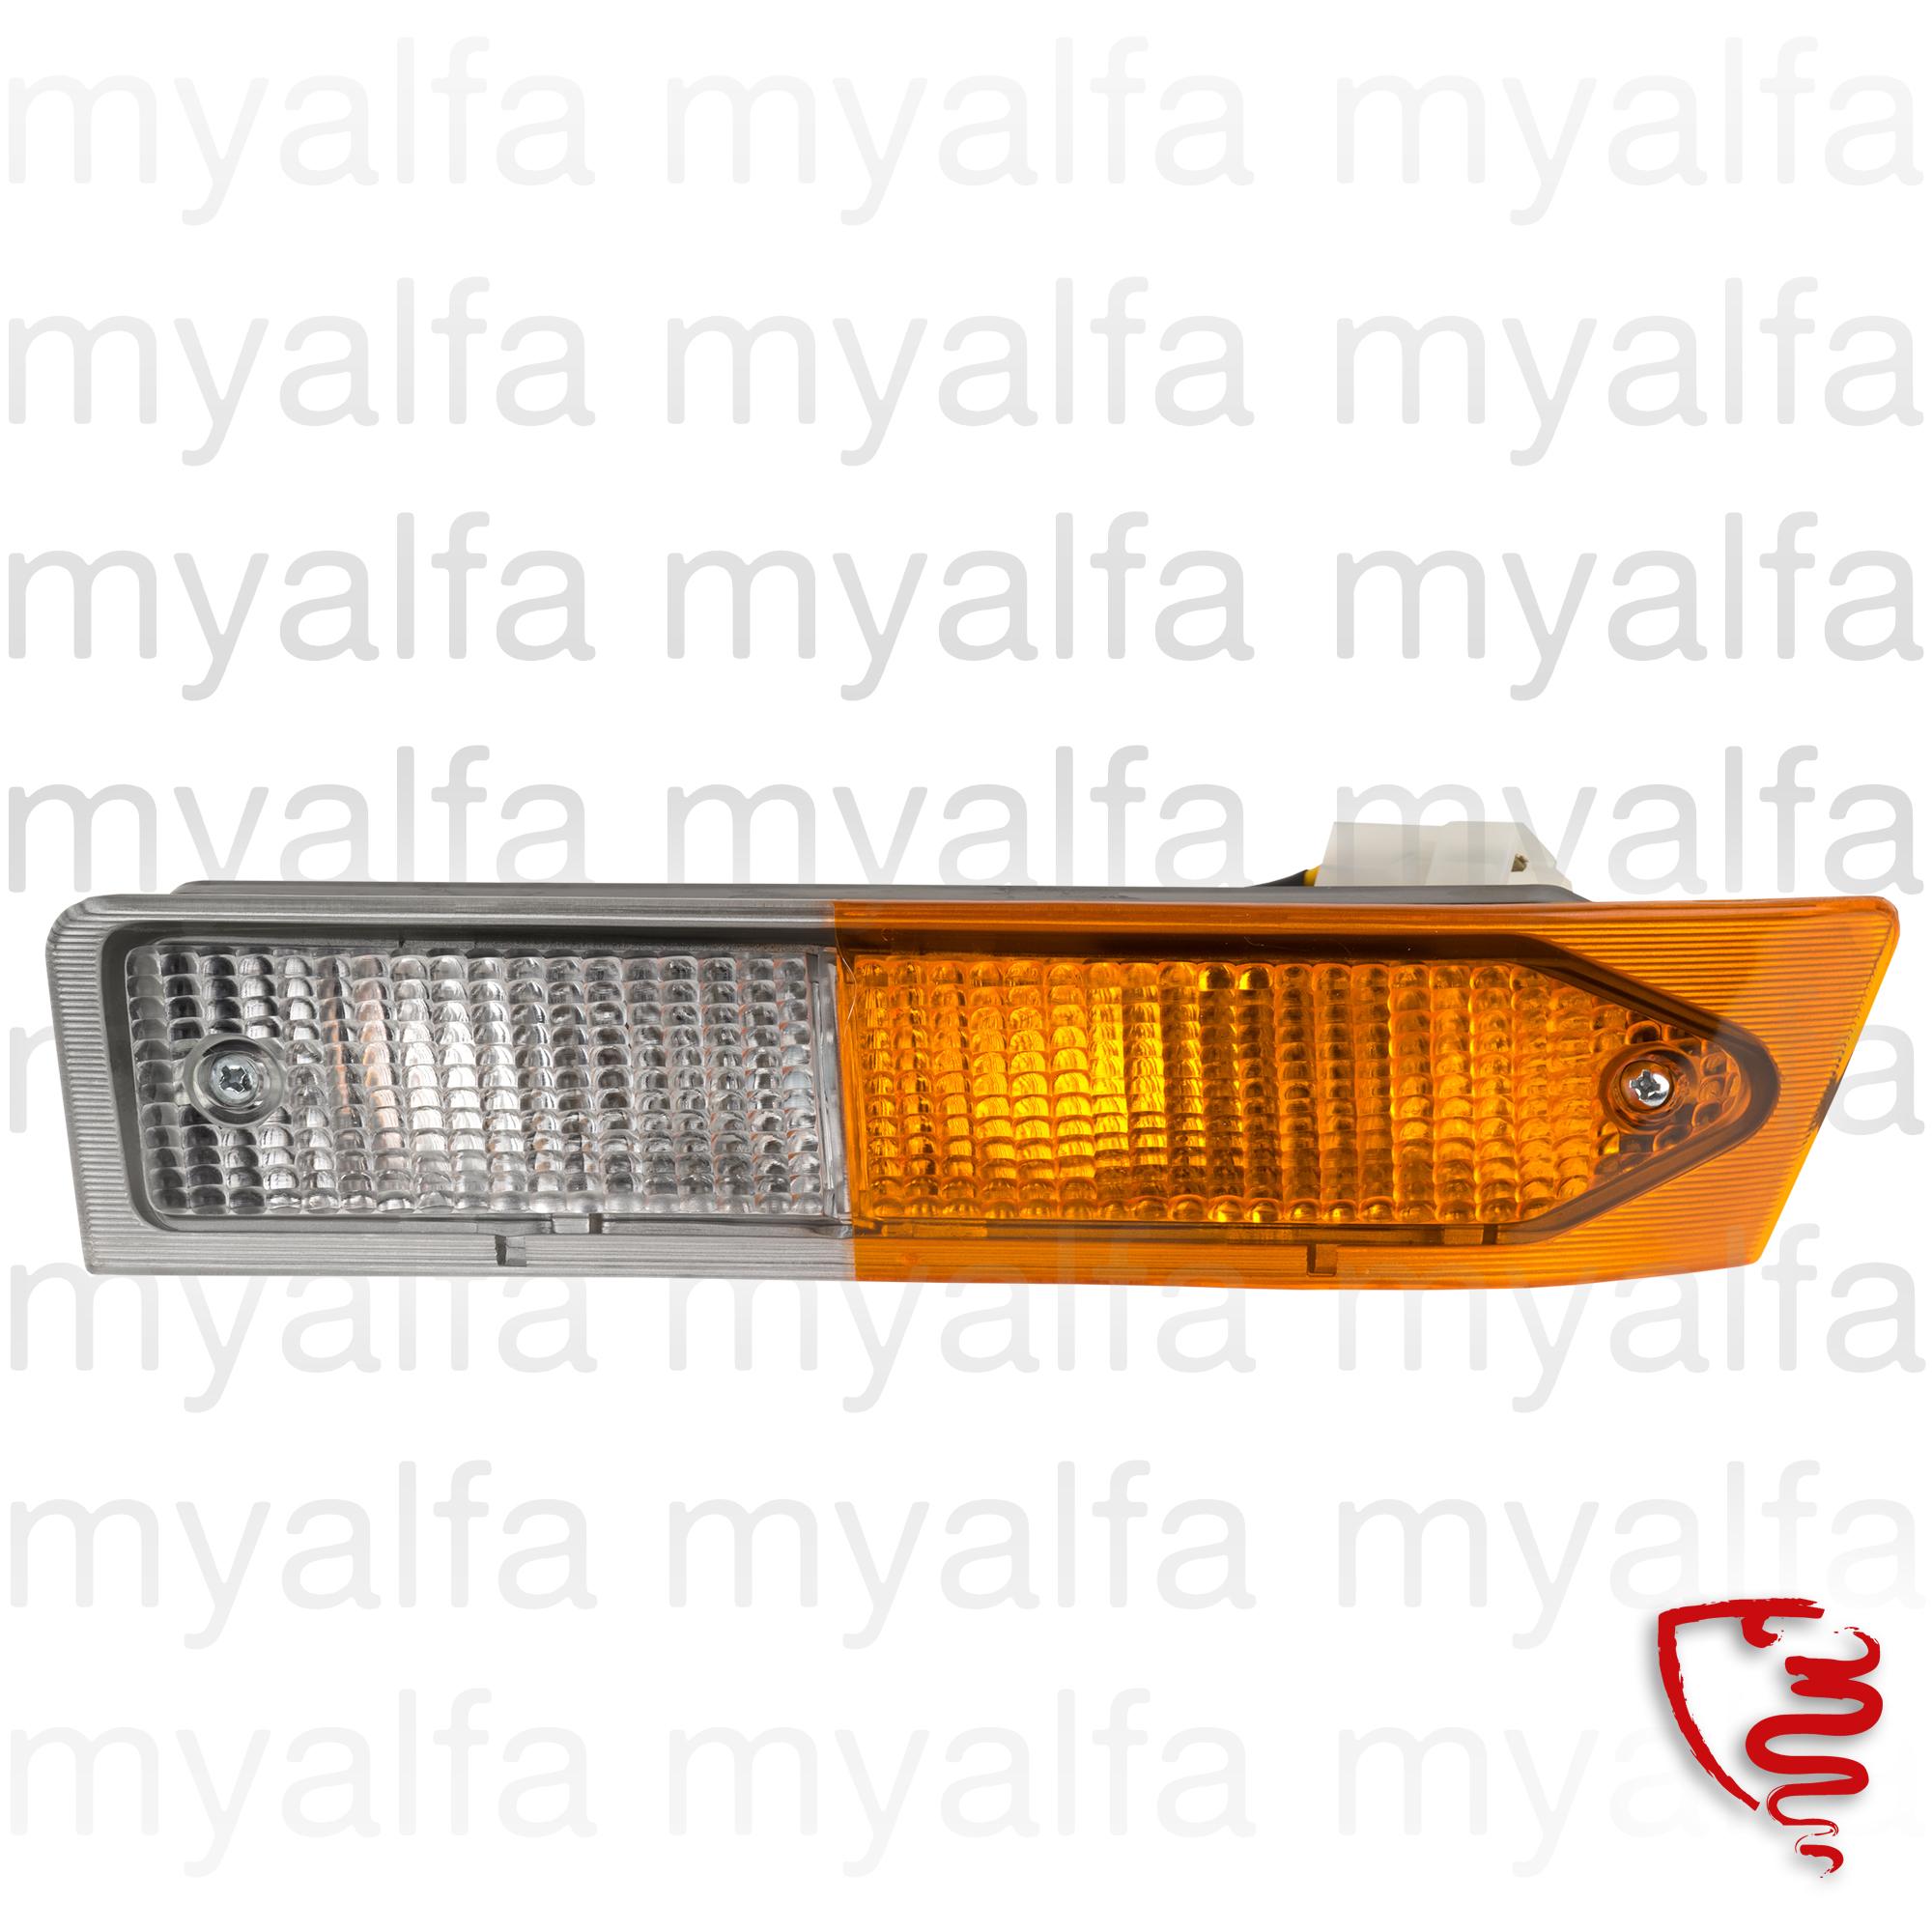 Beacon flashes and minimum frt. esq. Alfetta GTV 1st Series for 116/119, Body parts, Lighting, Indicators